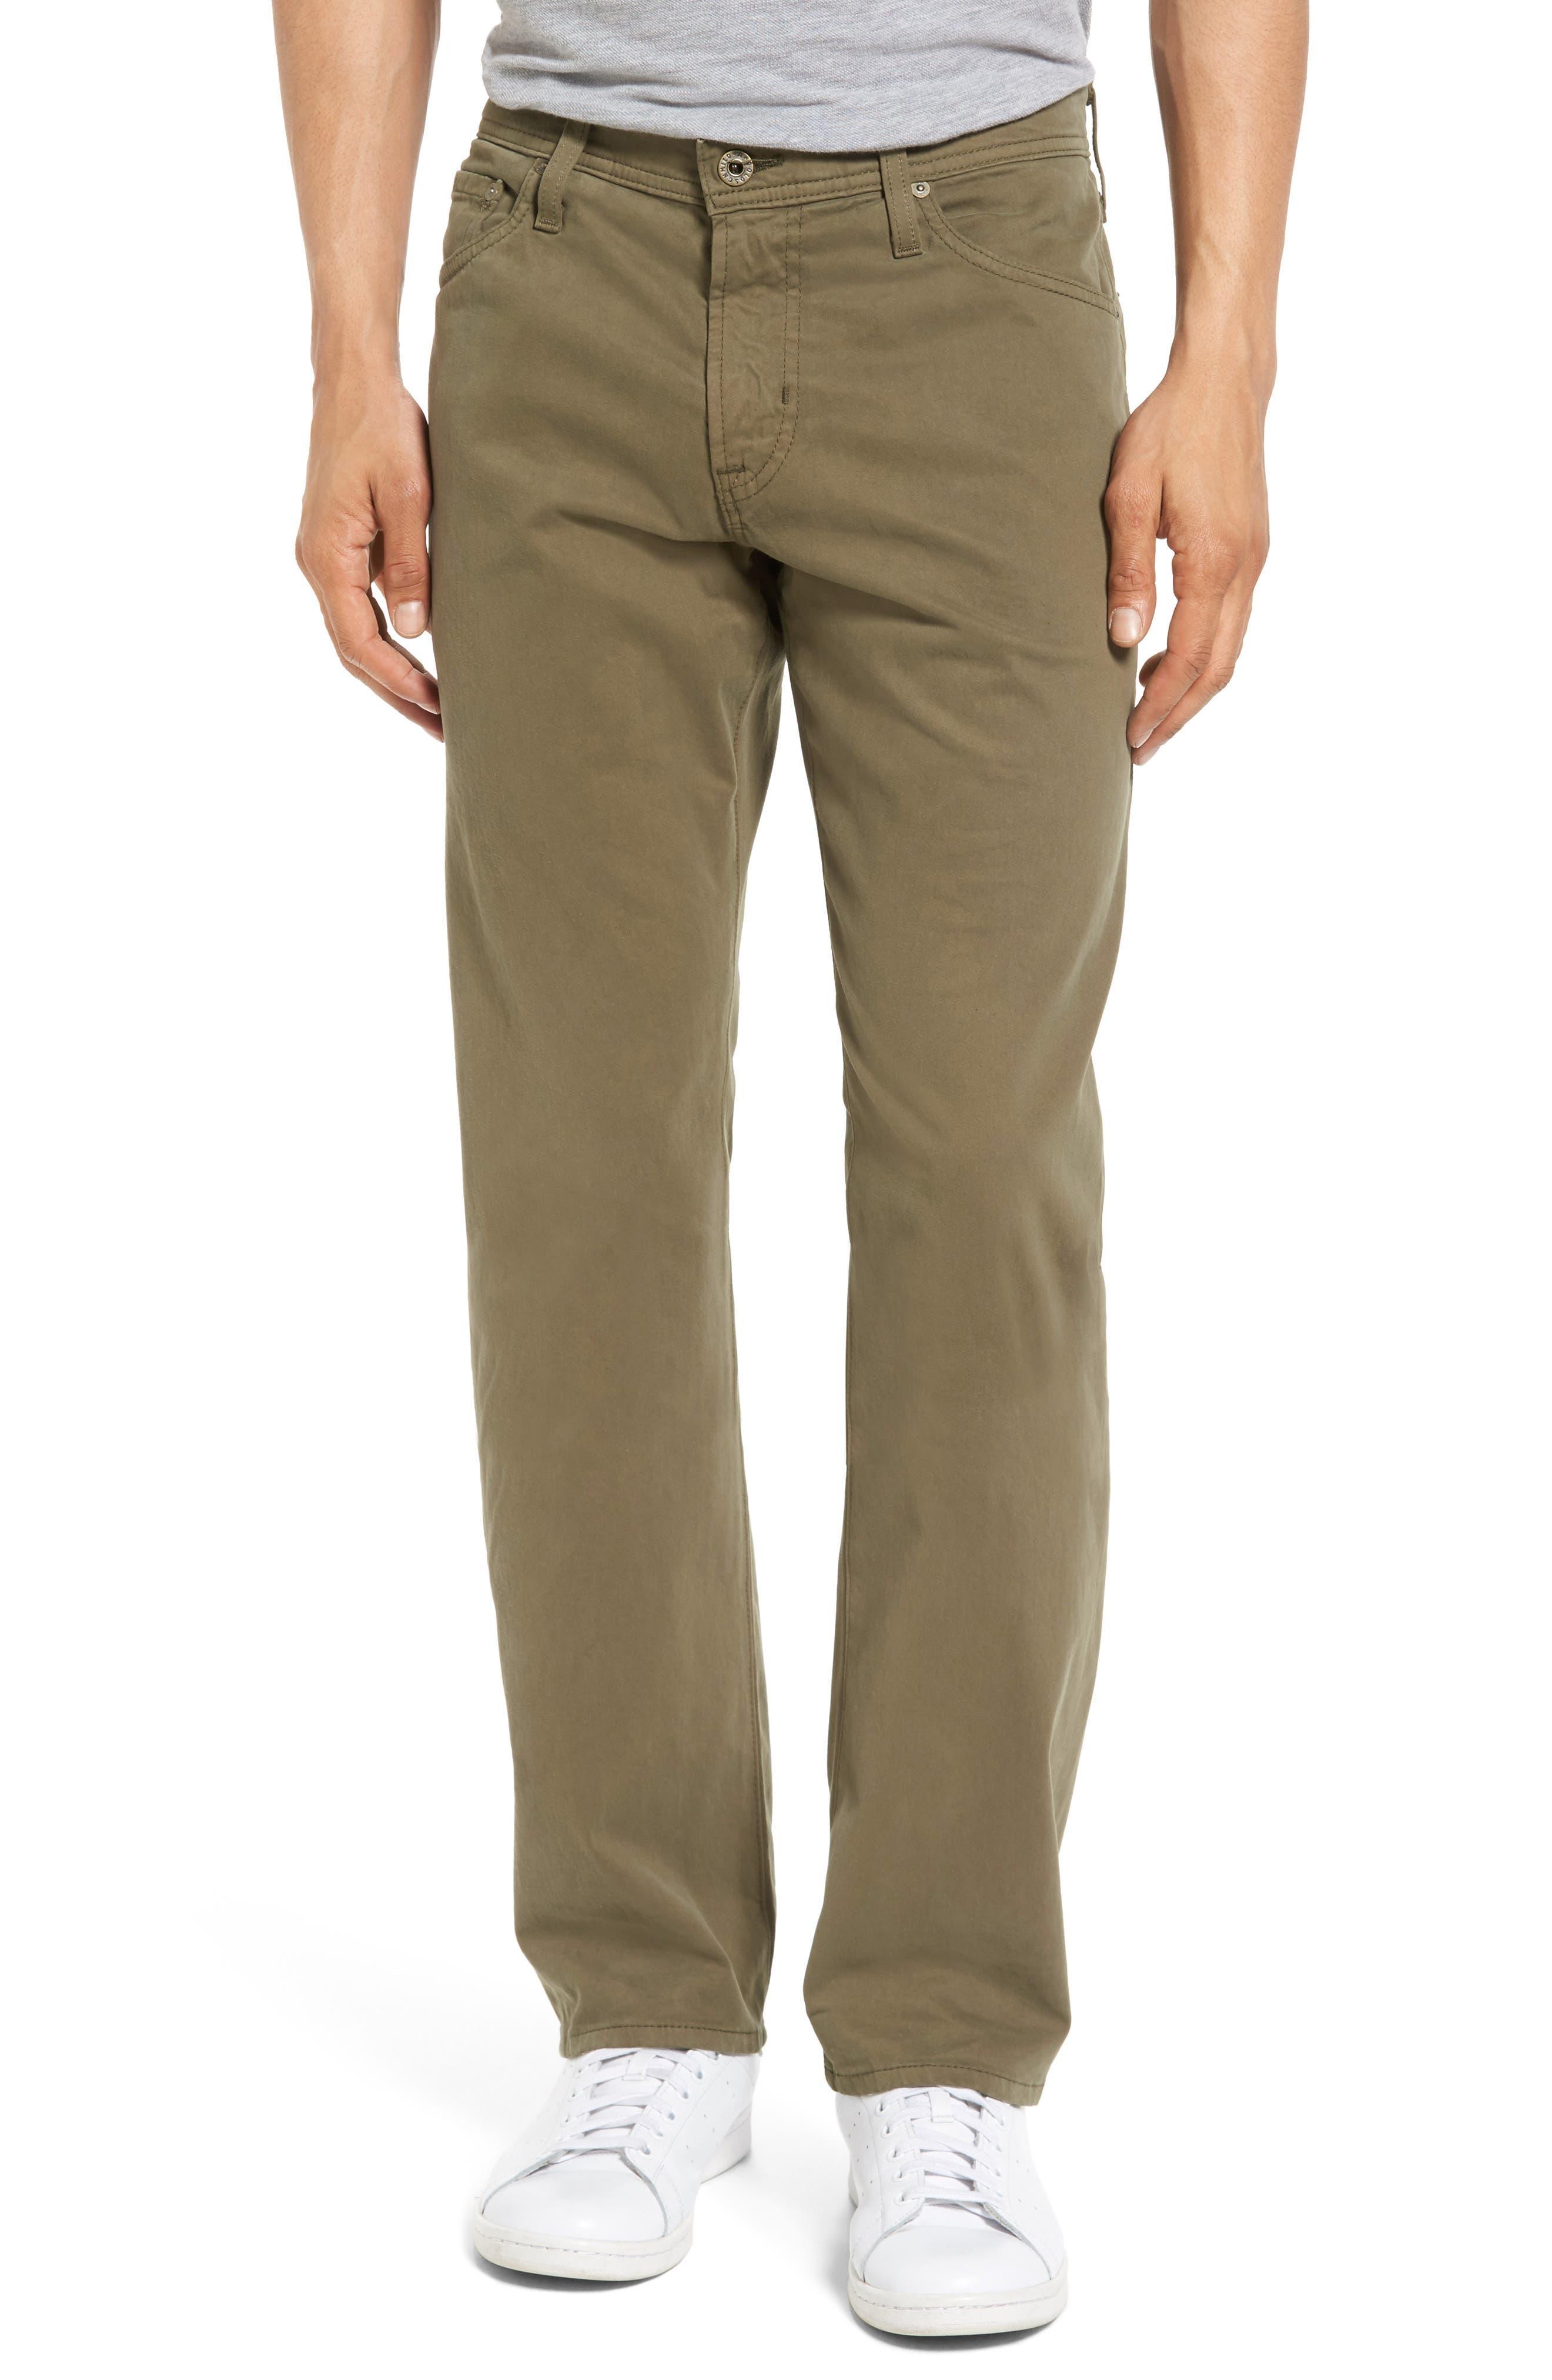 Graduate SUD Slim Straight Leg Pants,                             Main thumbnail 1, color,                             Caper Leaf